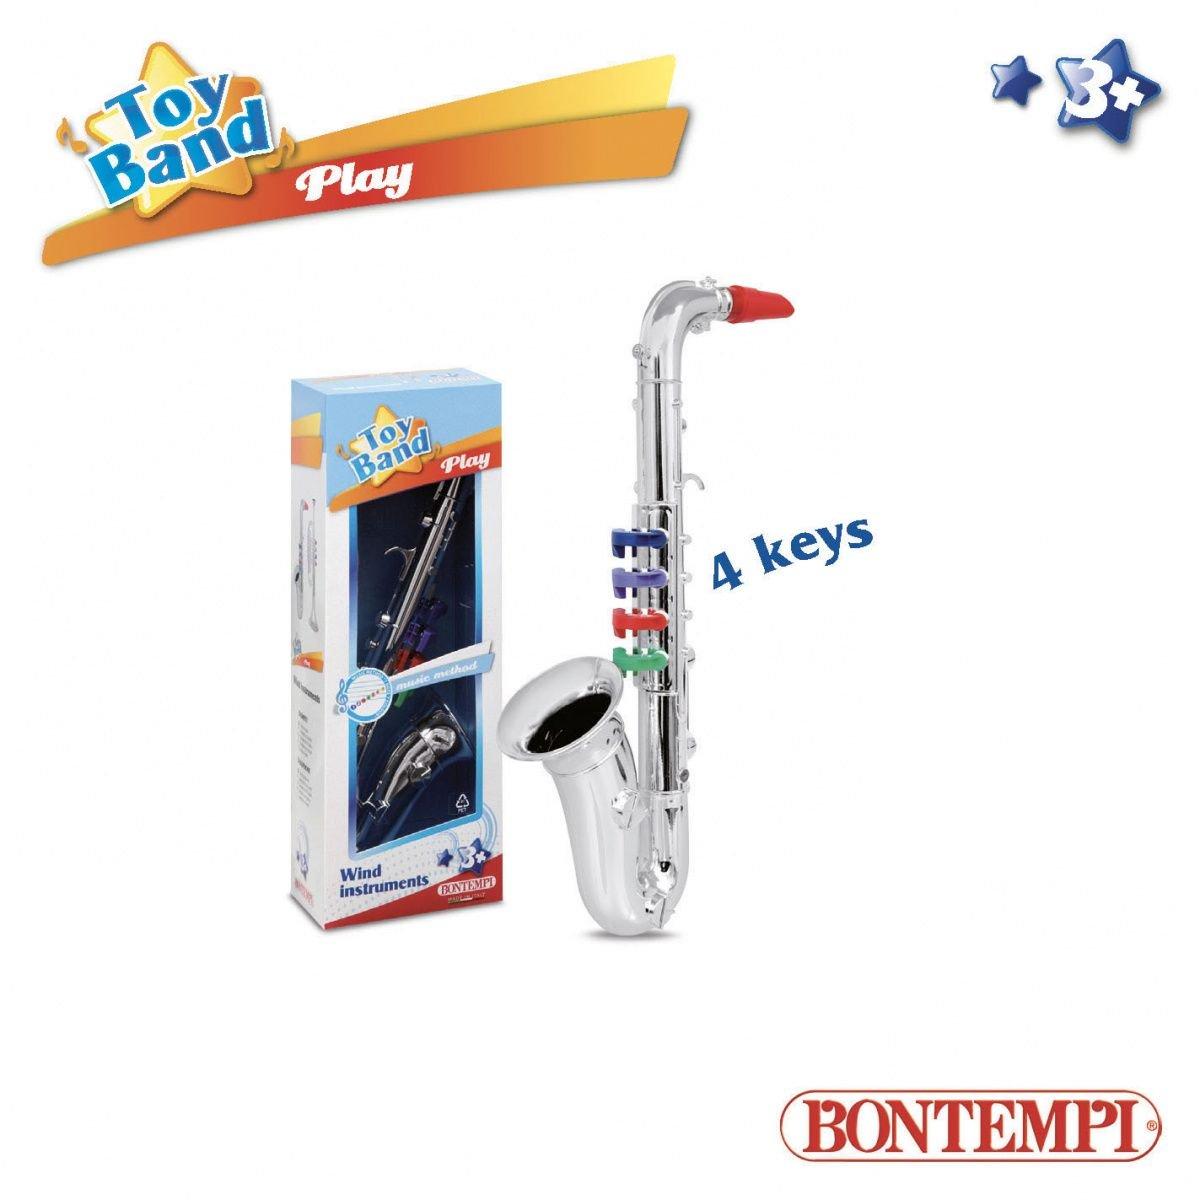 Dante Bontempi Play Silver Saxophone (041-14457) 041-14457